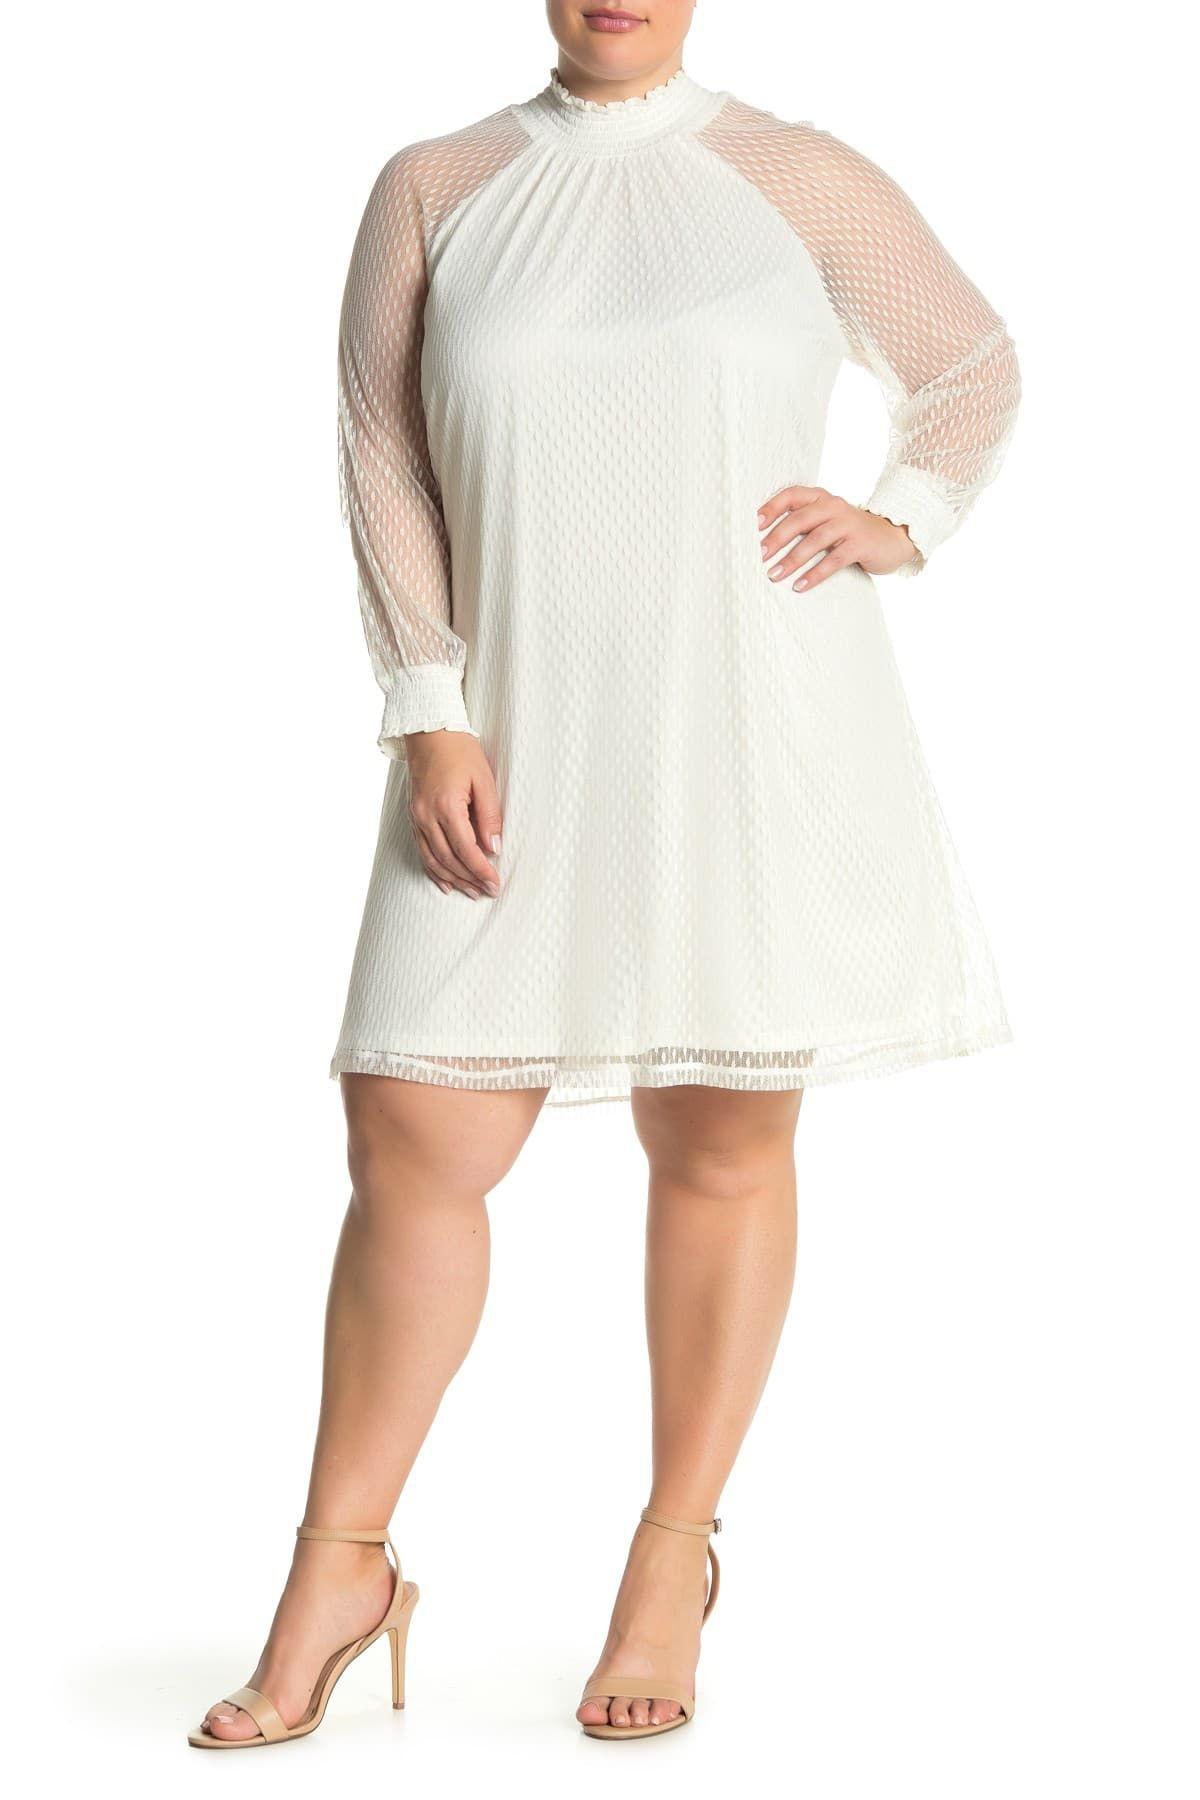 Nina Leonard Shirred Mock Neck Lace Trapeze Dress Nordstrom Rack In 2021 Trapeze Dress White Plus Size Dresses White Short Dress [ 1800 x 1200 Pixel ]